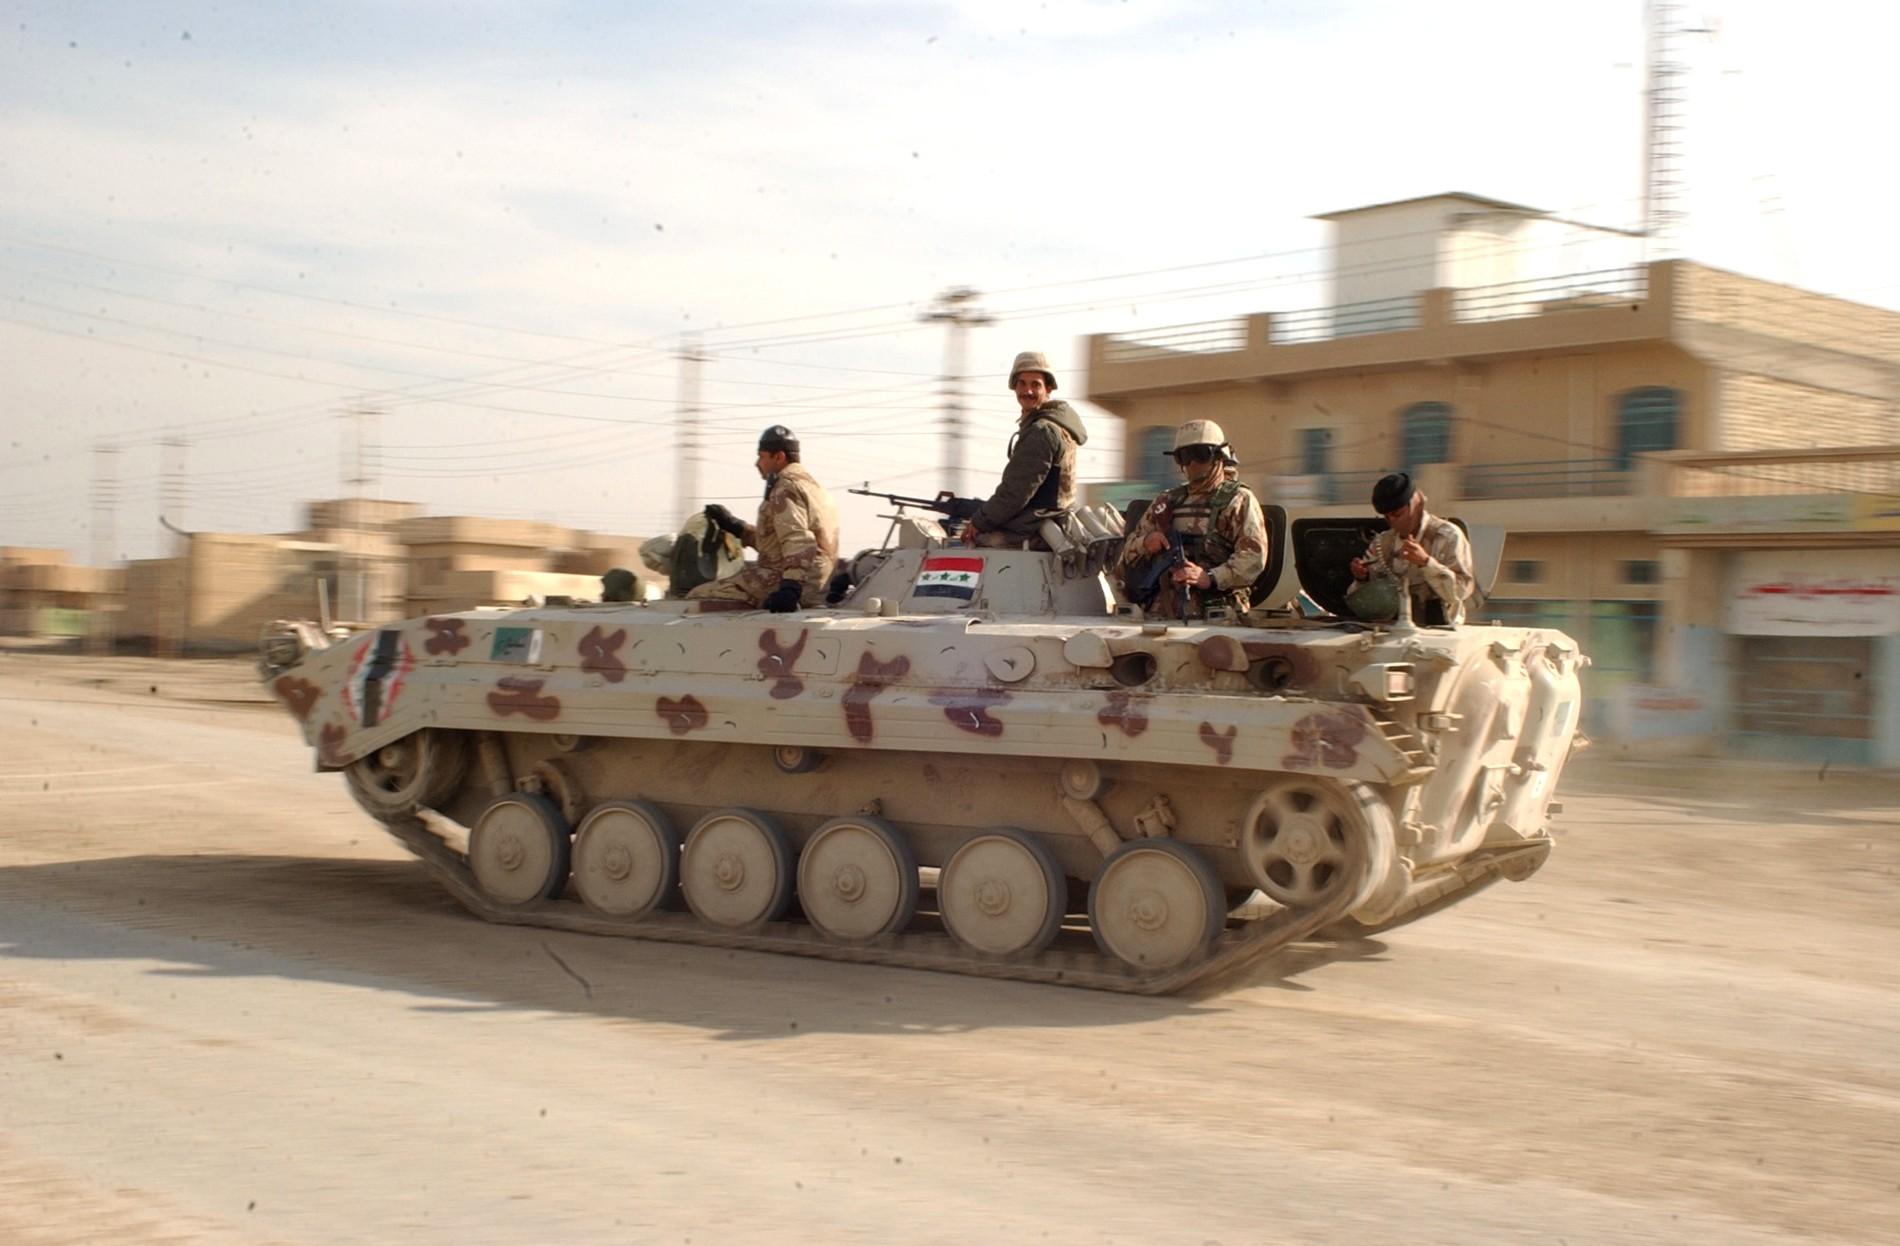 Soldats en Irak